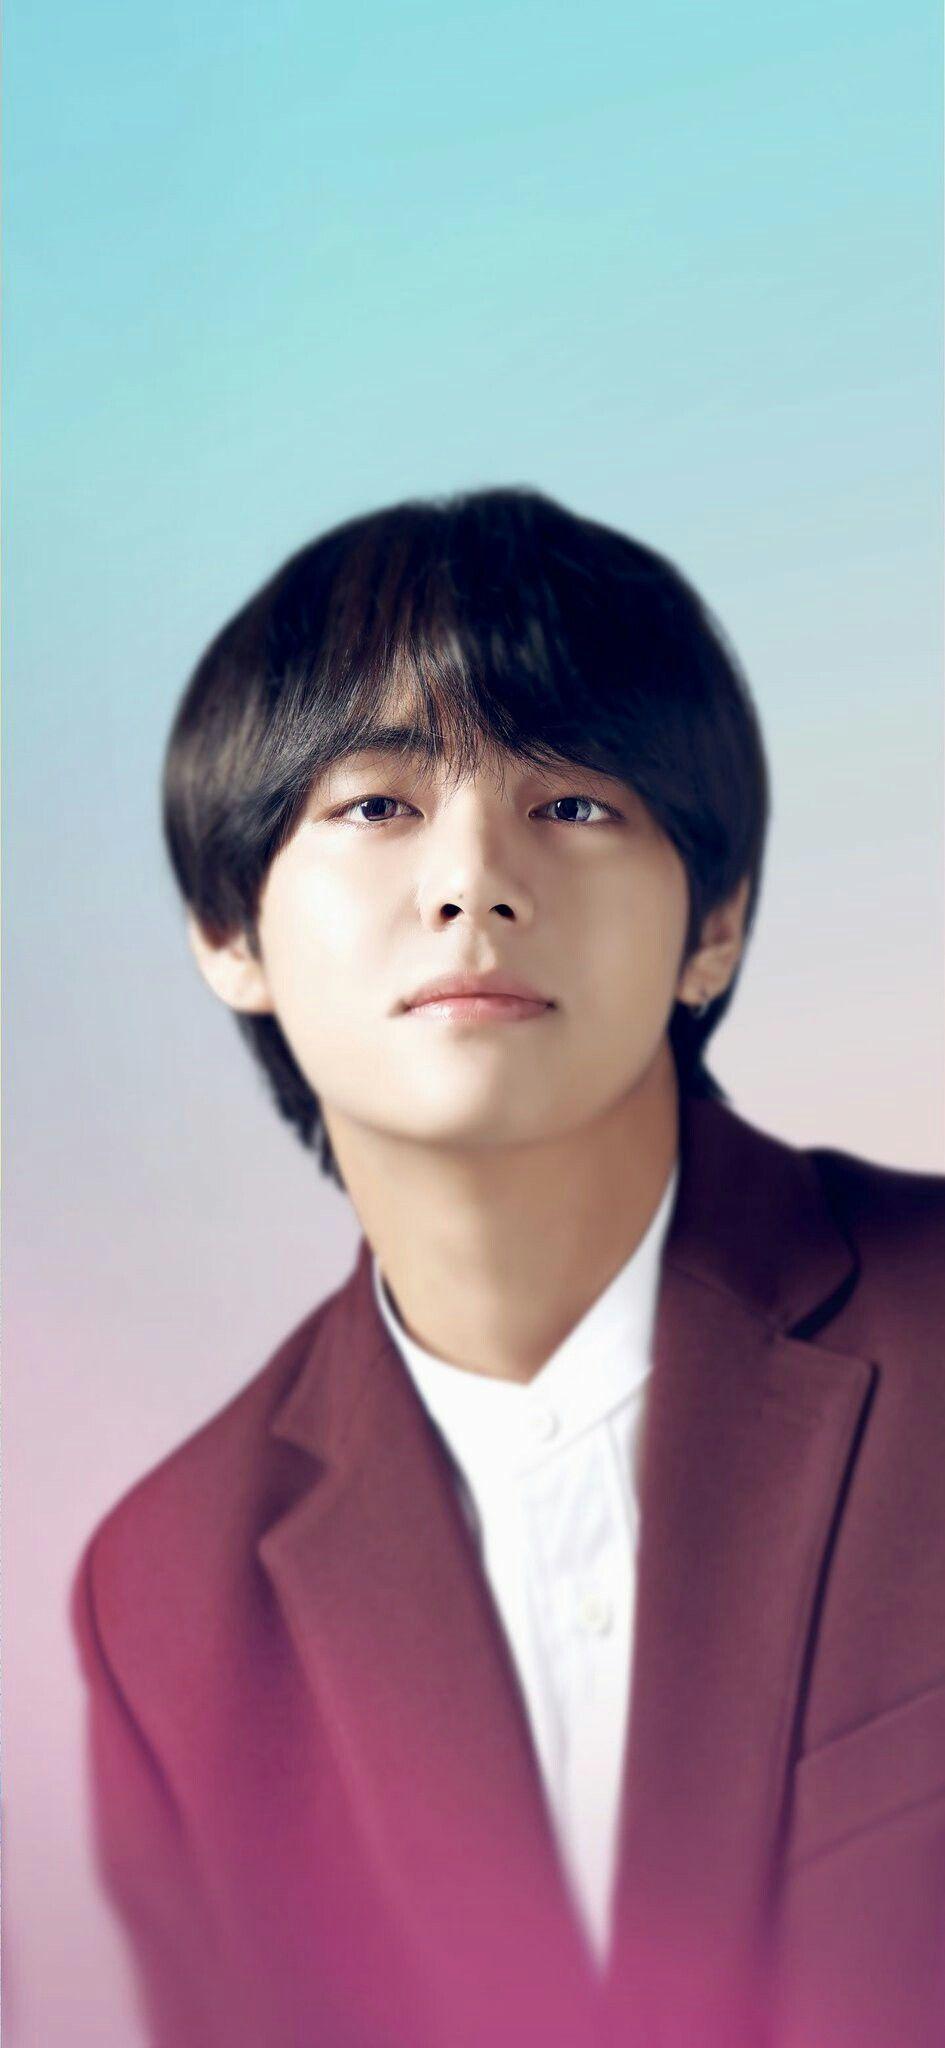 bts Taehyung v handsome LG wallpaper bighit 945x2048